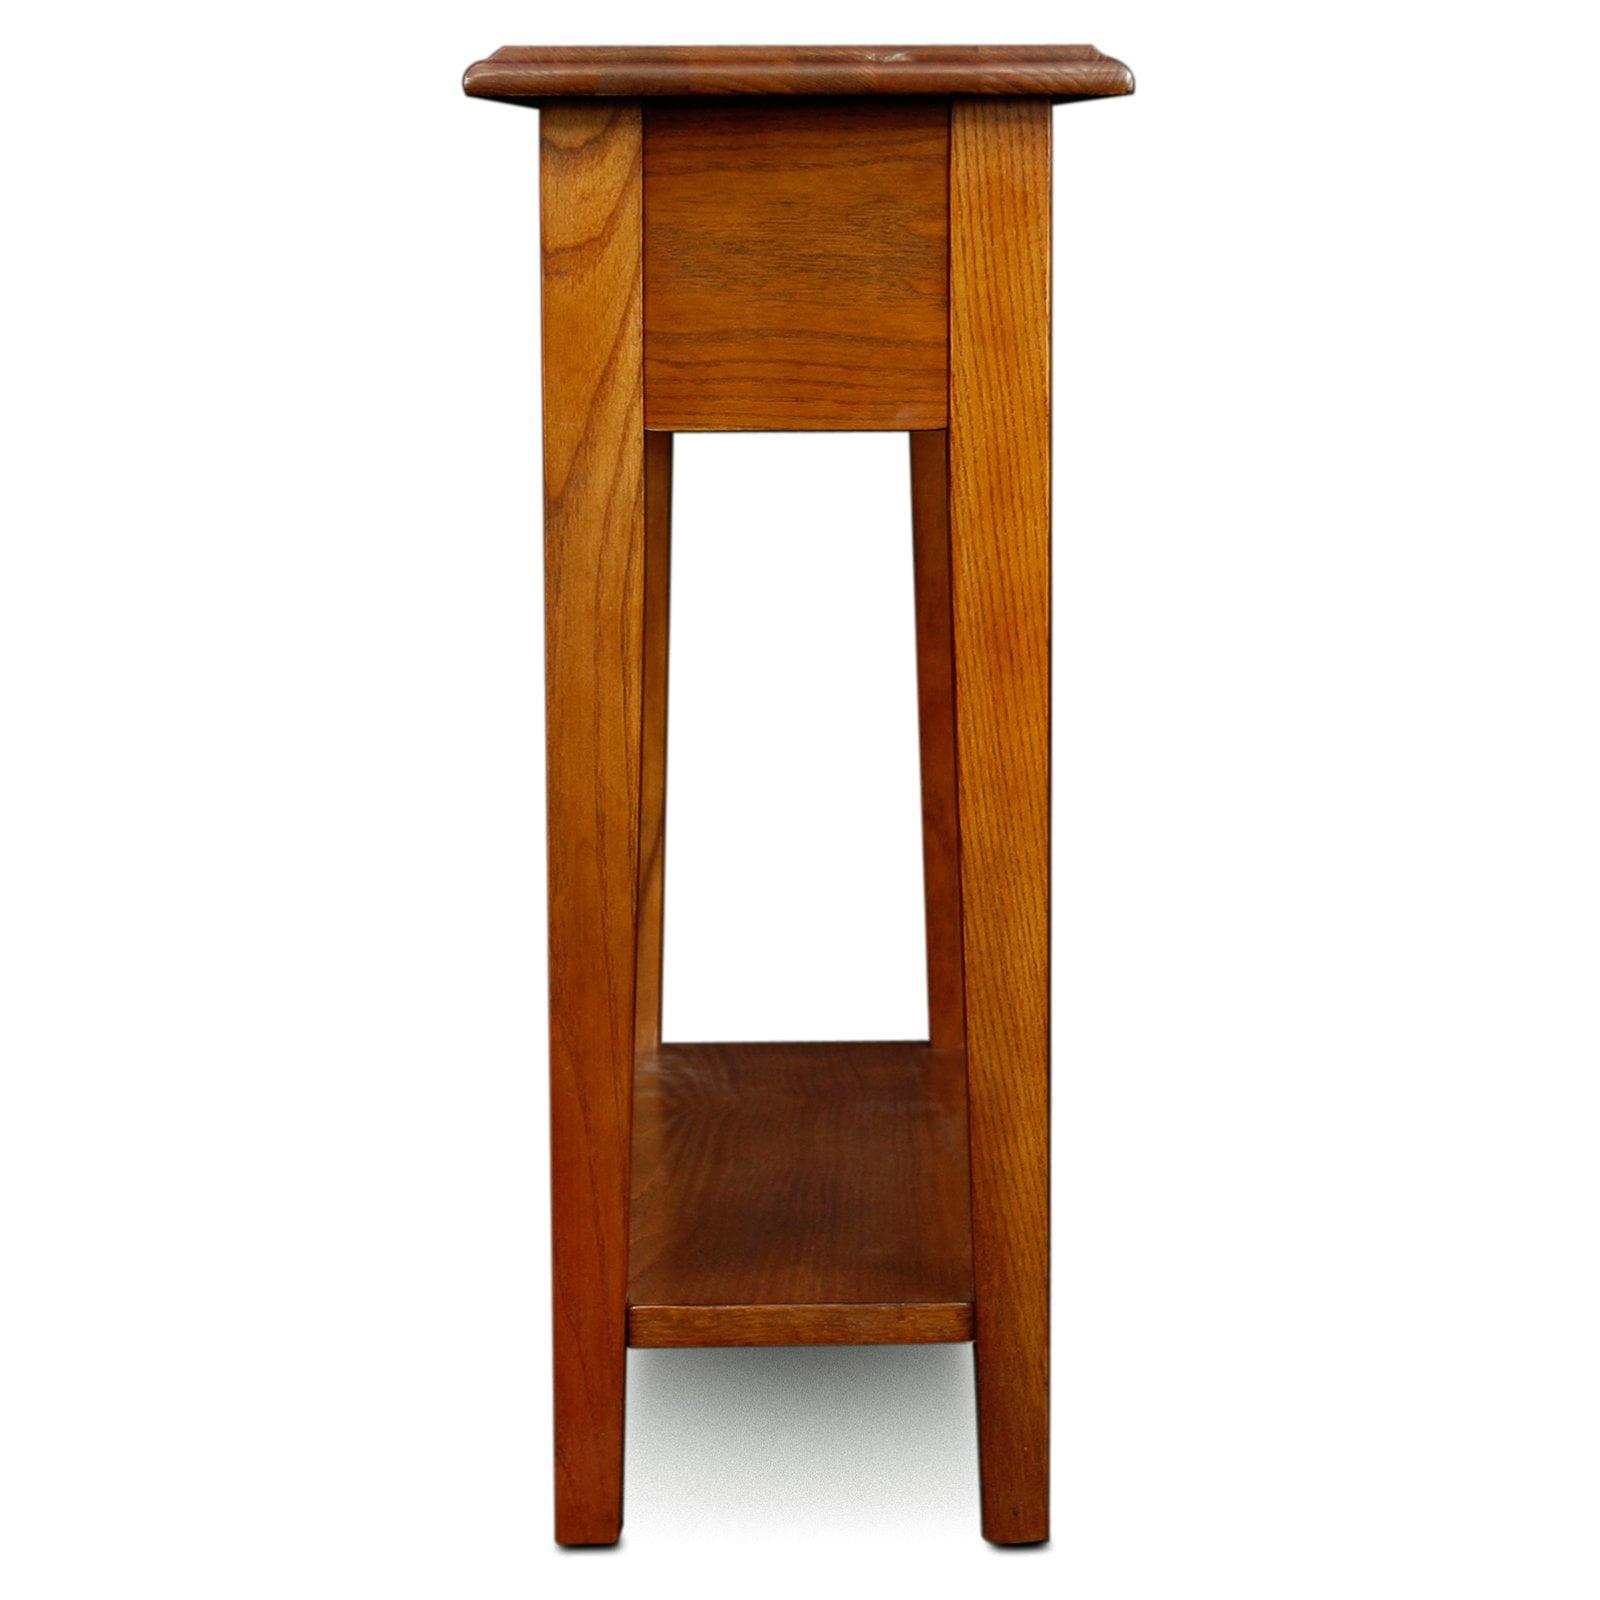 Hardwood 10 Inch Chairside End Table In Medium Oak   Walmart.com